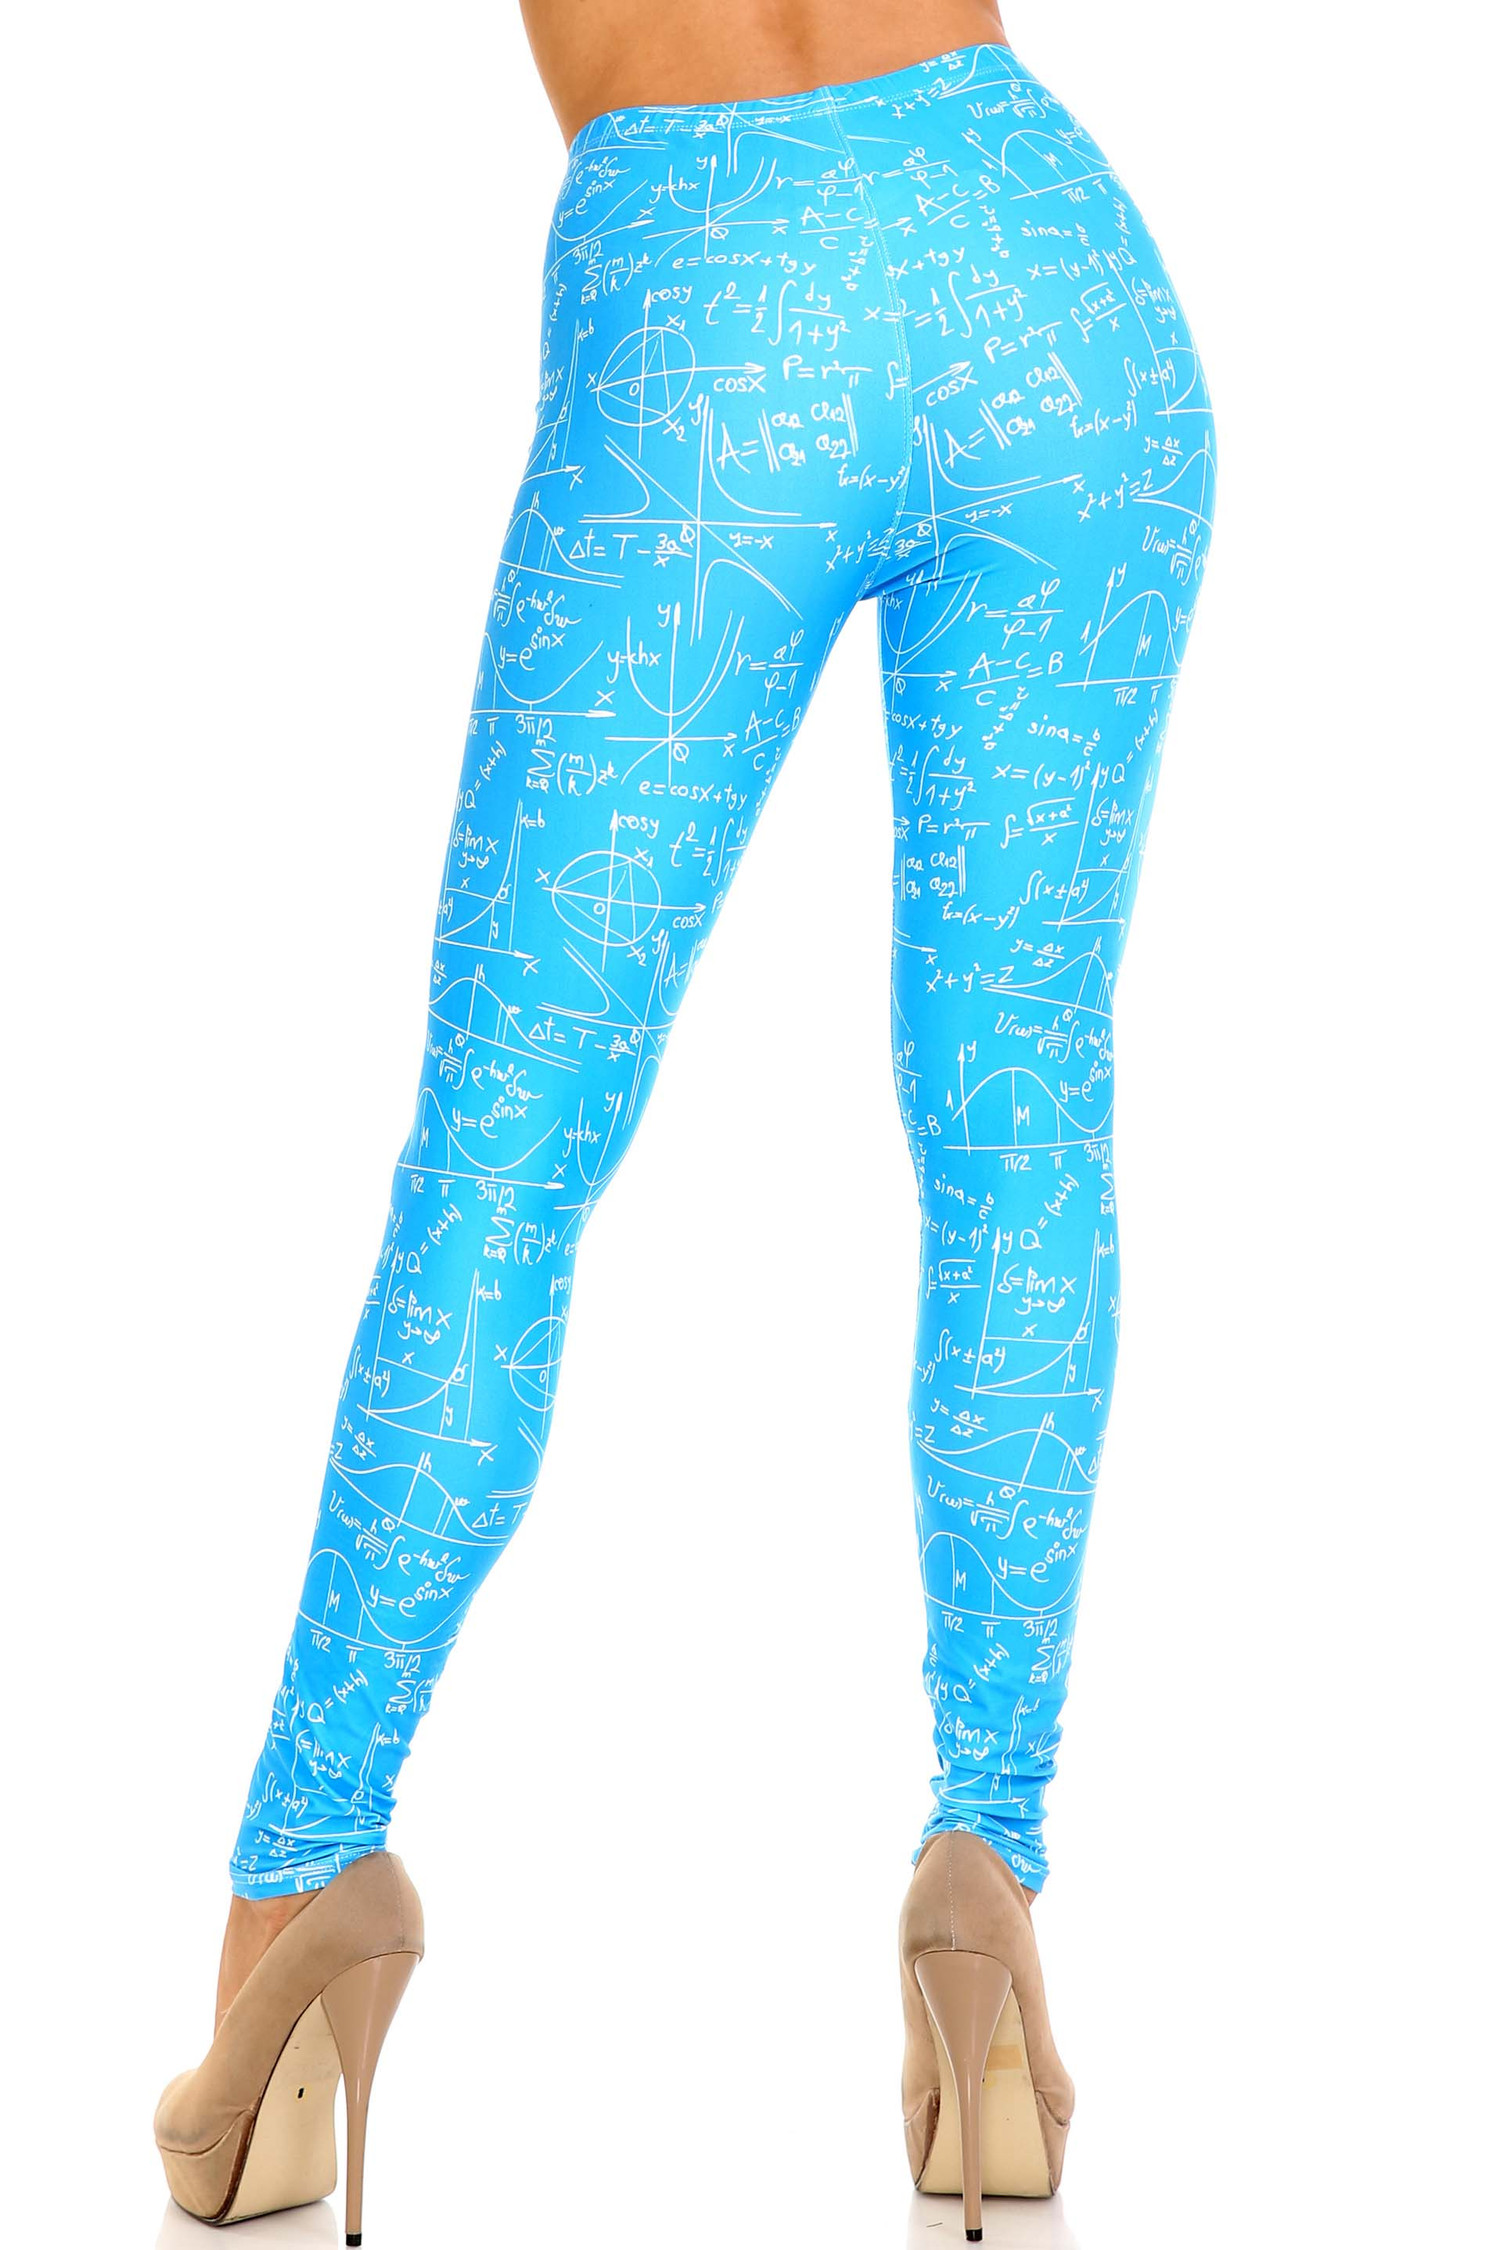 Creamy Soft Stained Blue Math Extra Plus Size Leggings - 3X-5X - USA Fashion™